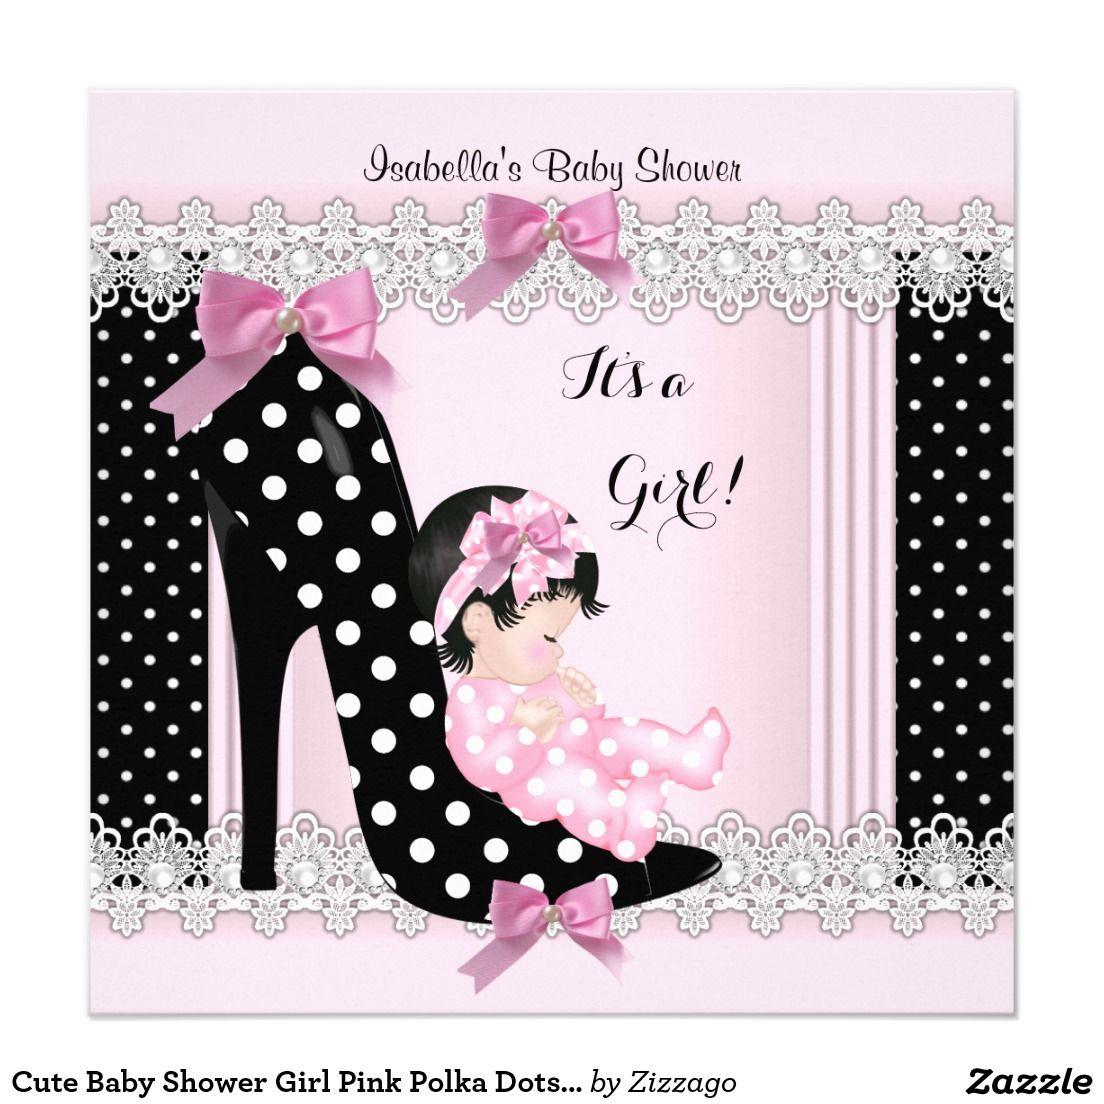 cute baby shower girl pink polka dots high heel 6a invitation in